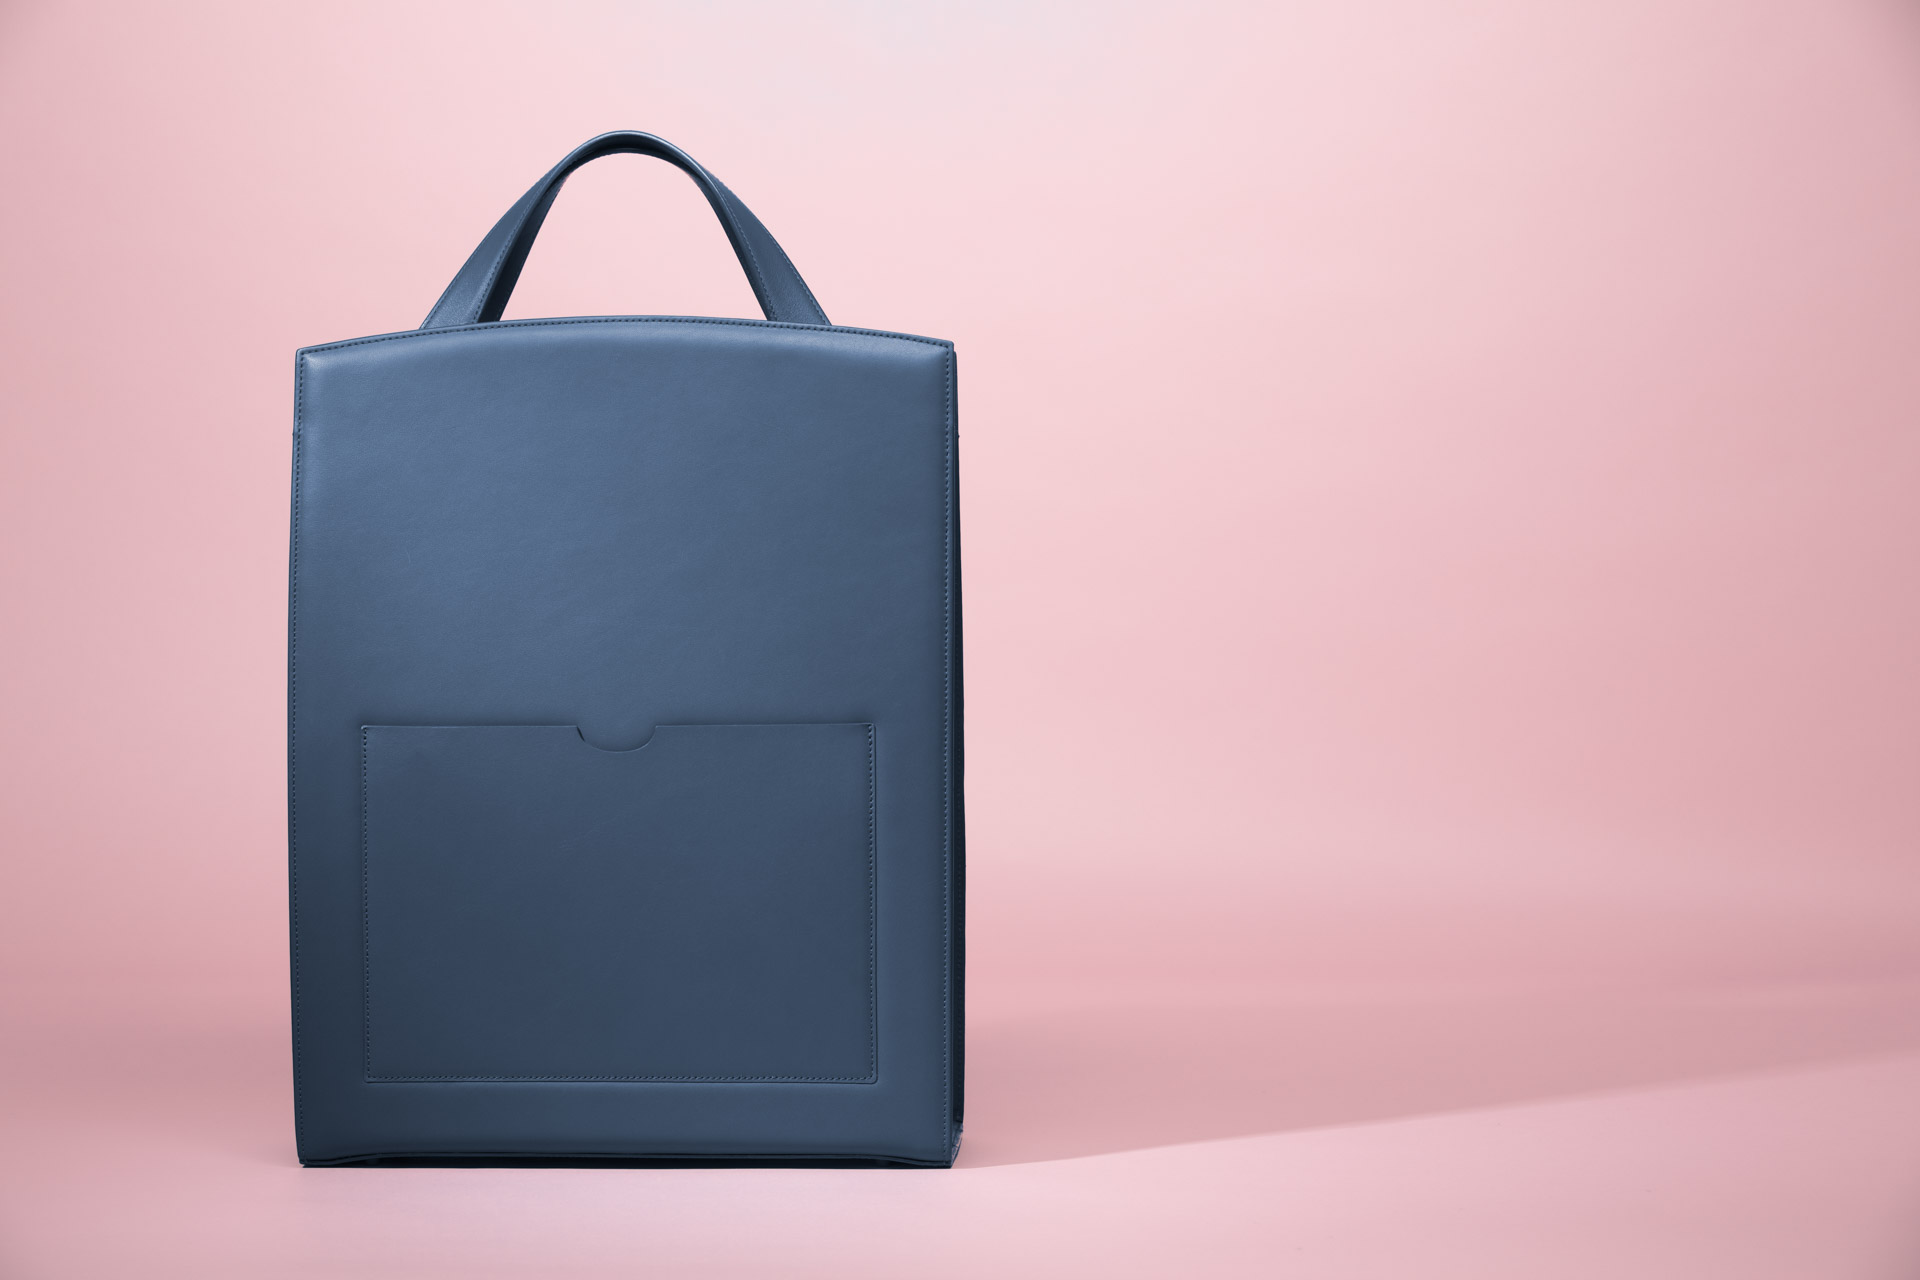 WEB Backup bags shop presentation-26.jpg